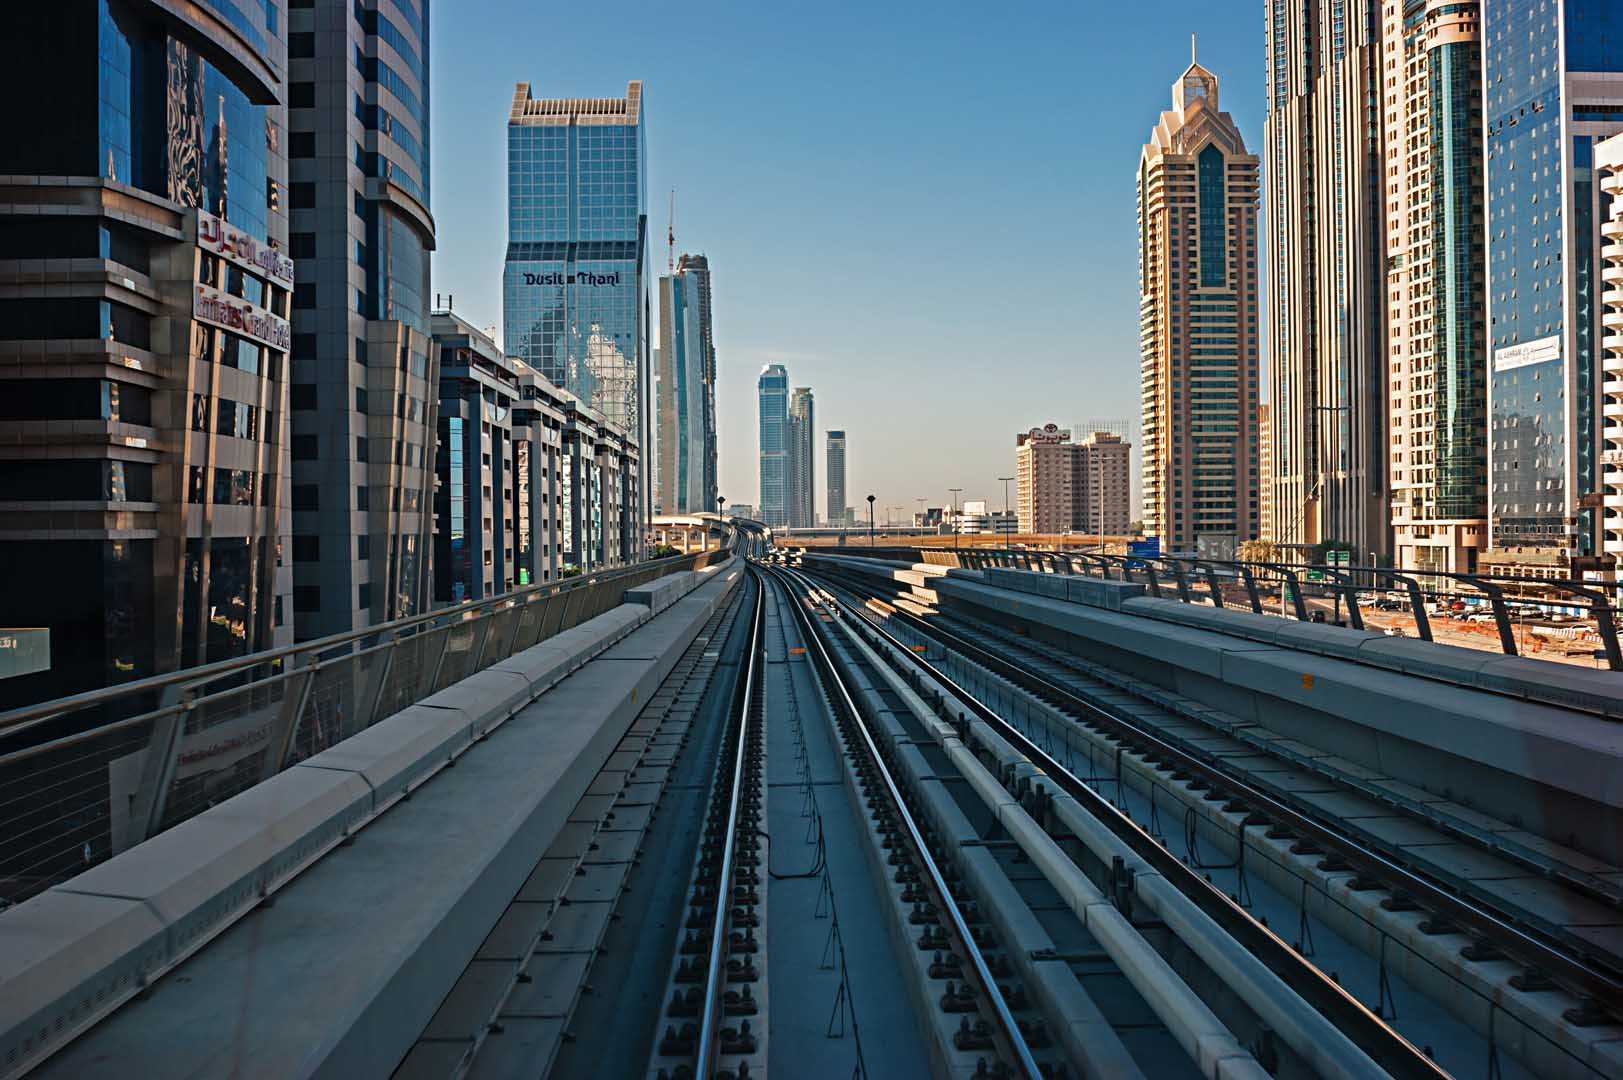 Pathways & pitfalls to better sub-urban planning